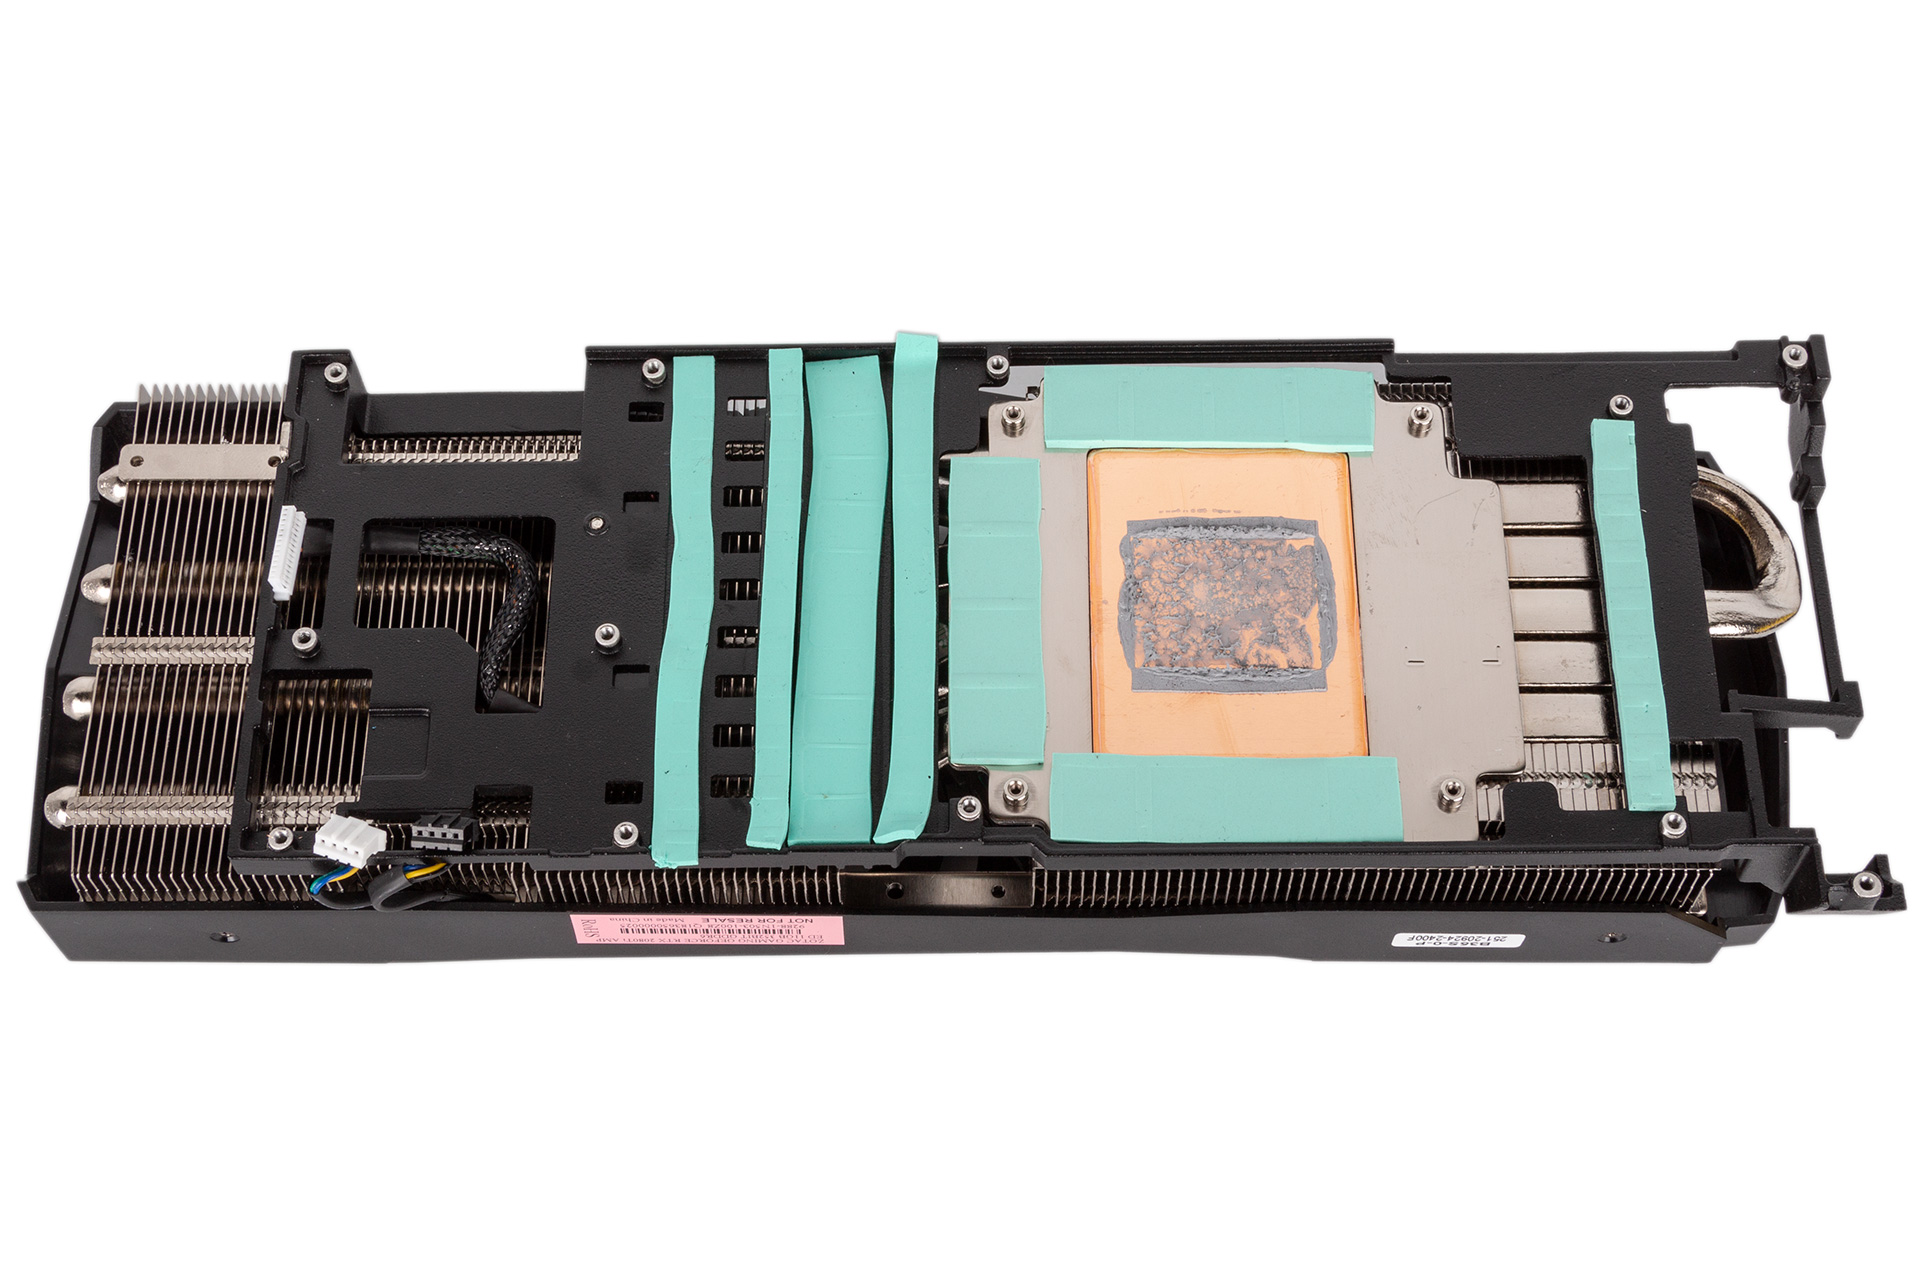 Zotac Gaming GeForce RTX 2080 Ti Amp Review   bit-tech net